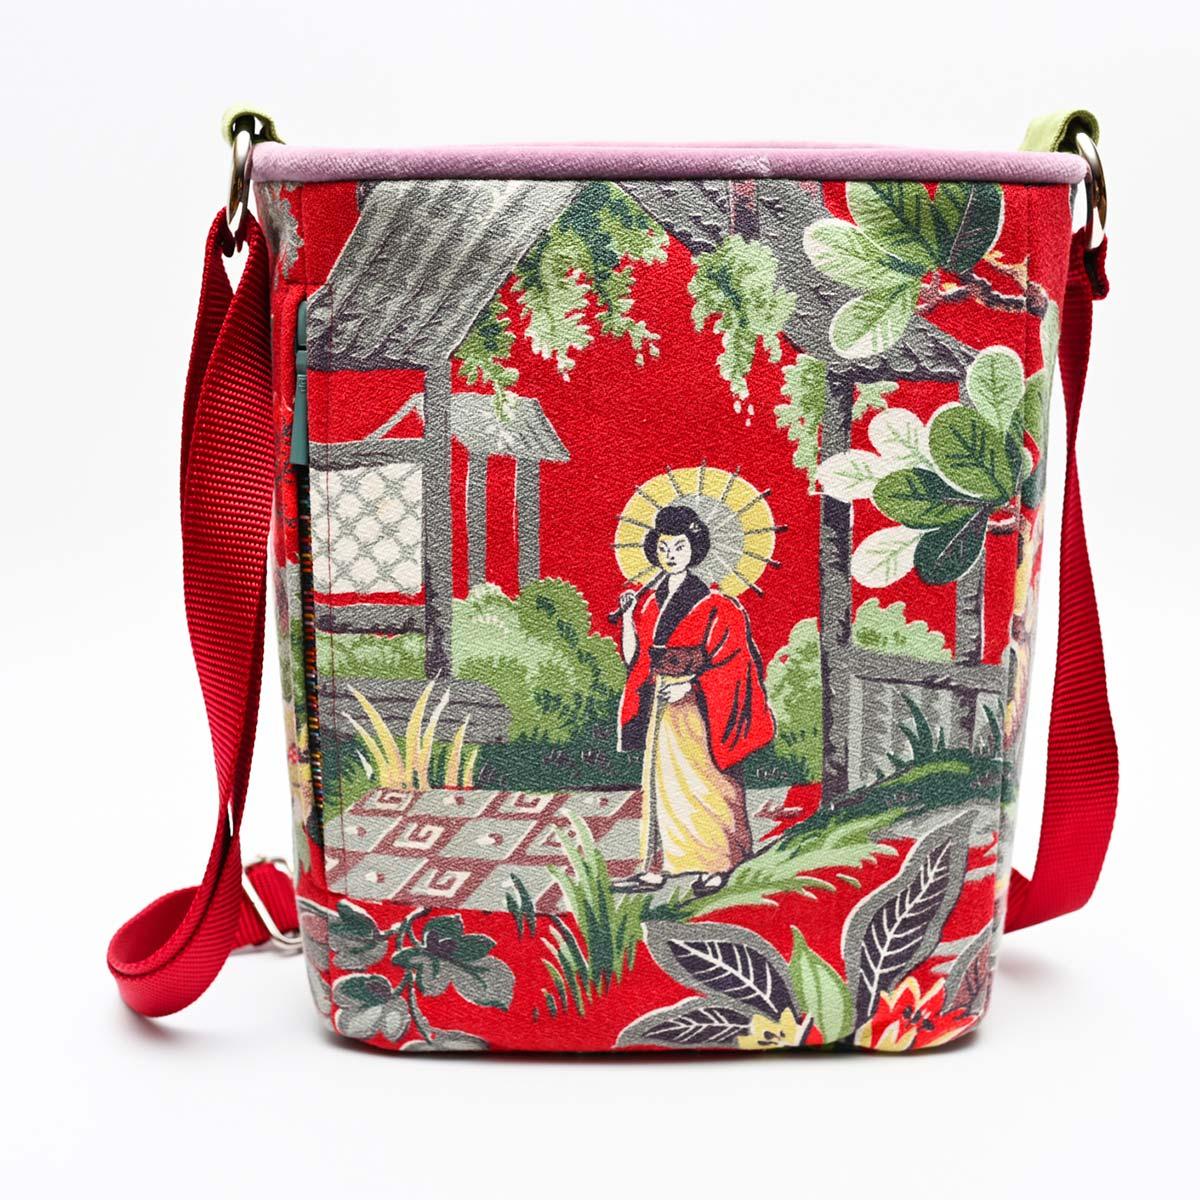 crossbody bag asian motif on red